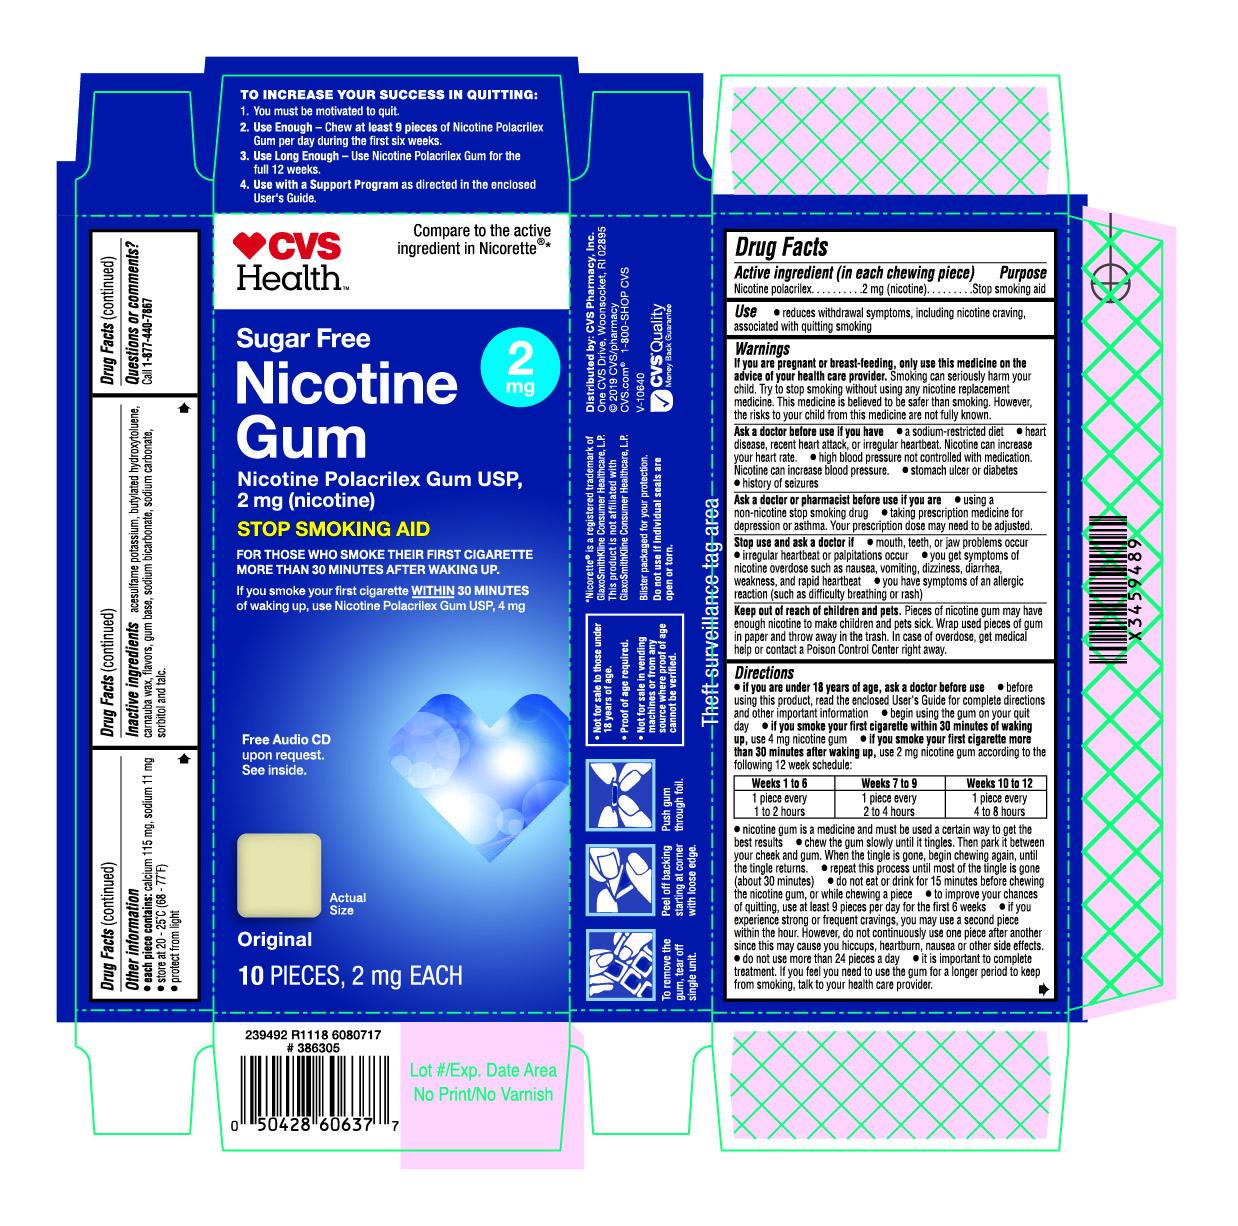 2 mg original 10 count